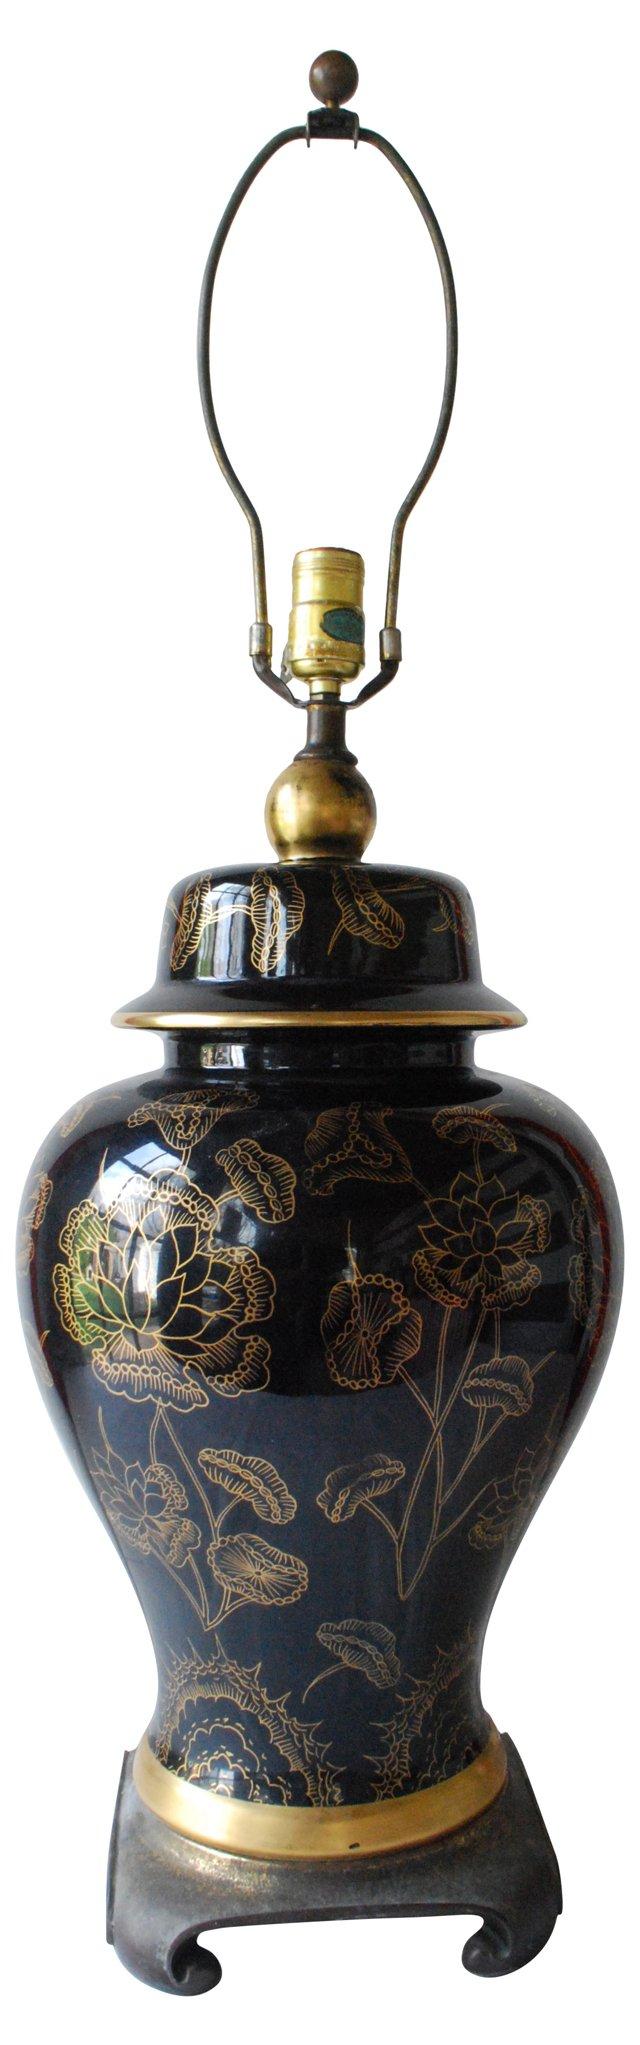 Black Lotus Ginger Jar Lamp